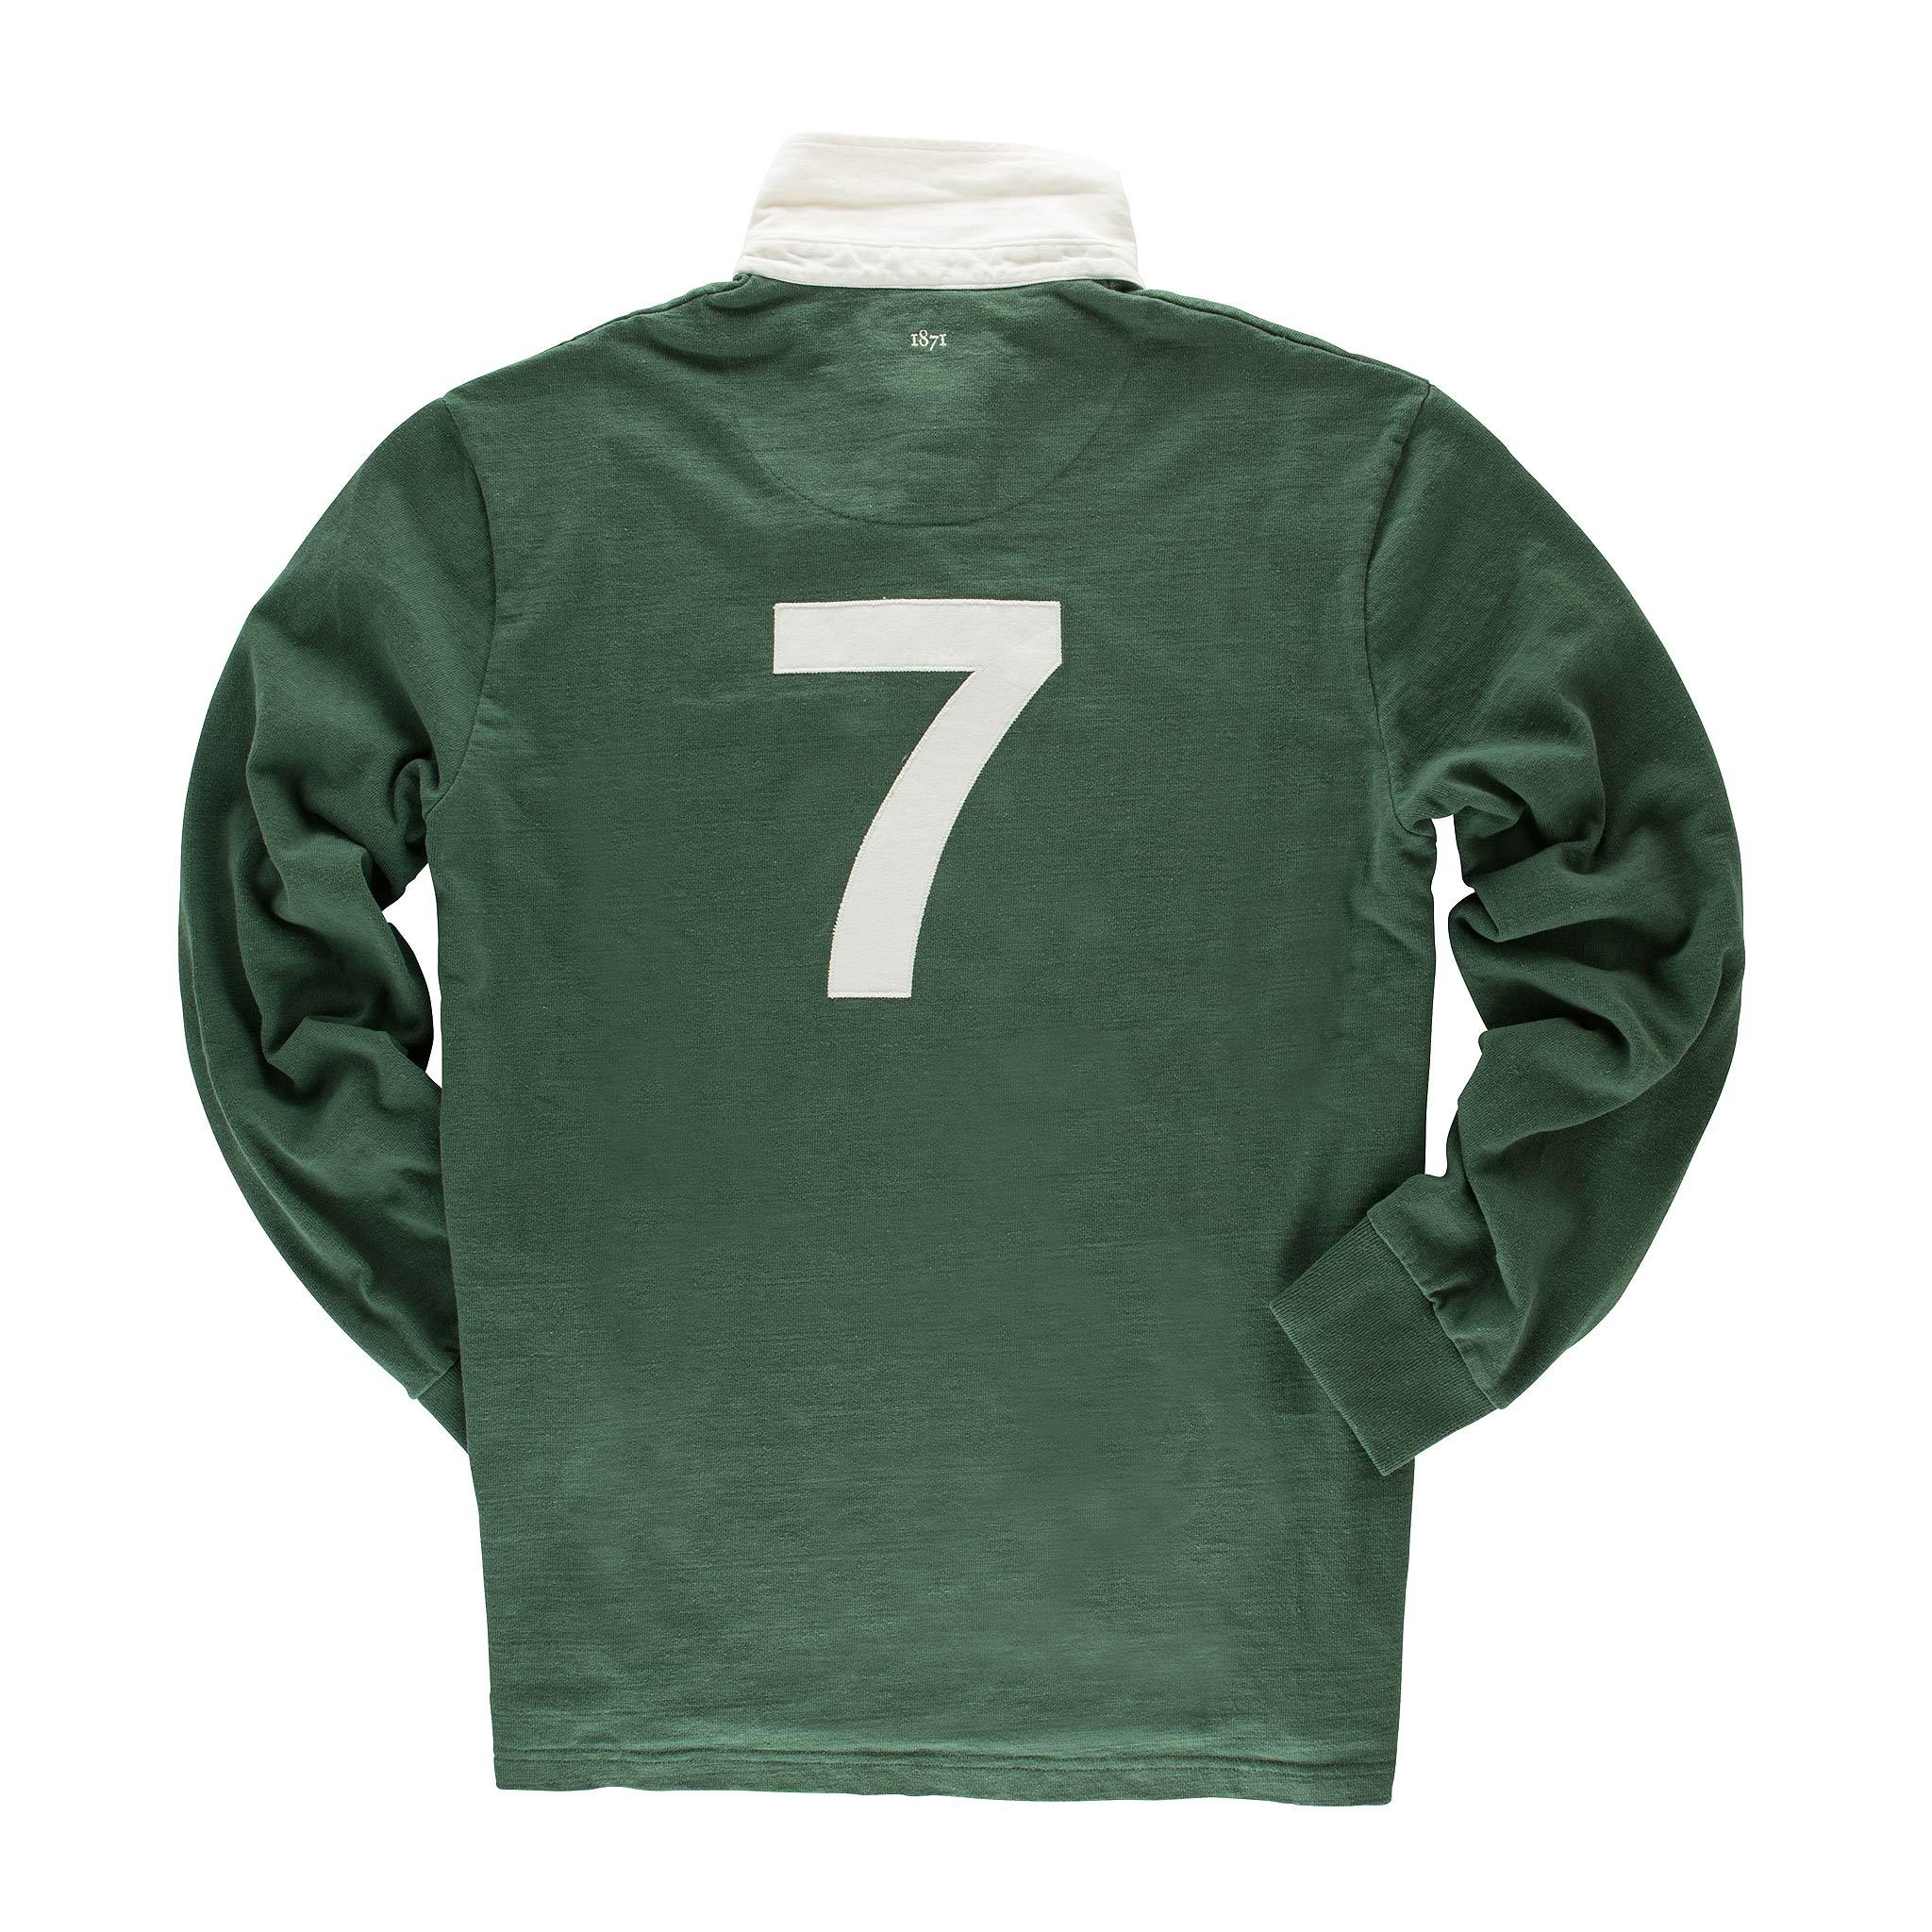 West Kent 1871 Rugby Shirt - back